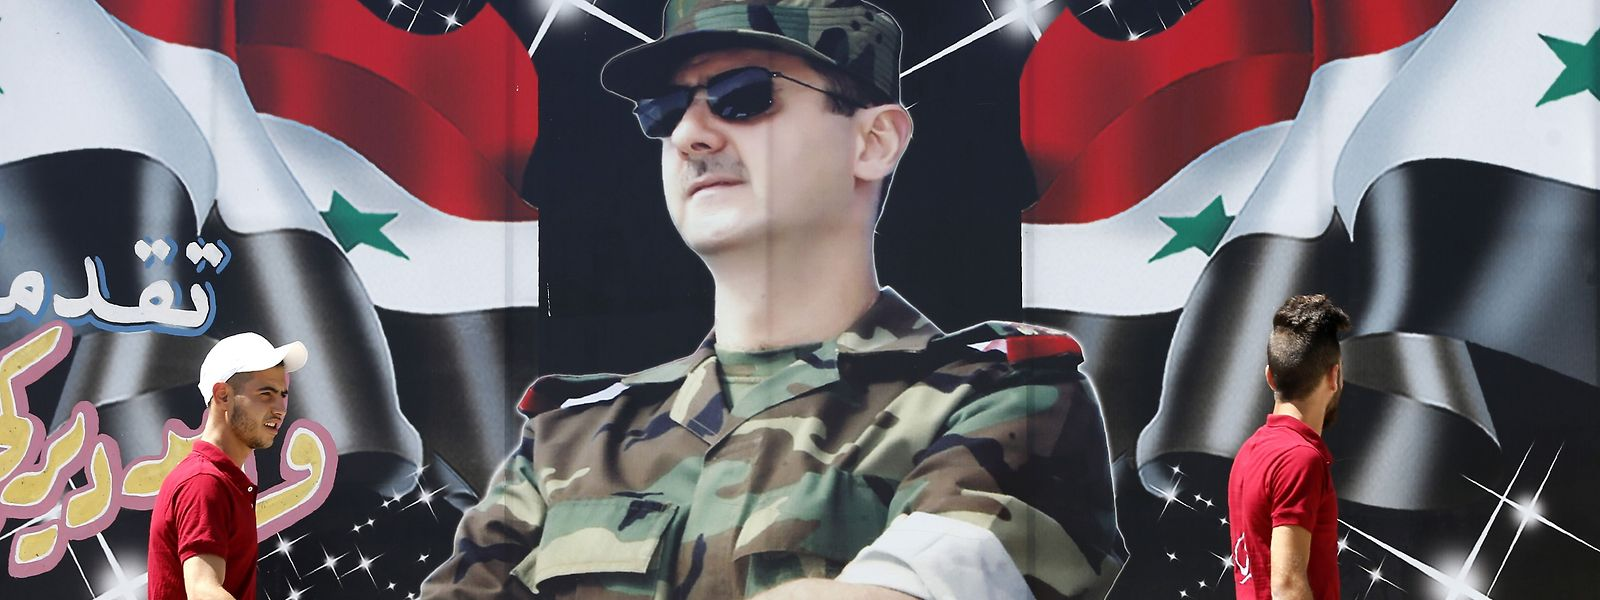 Al-Assad père en chef de guerre.